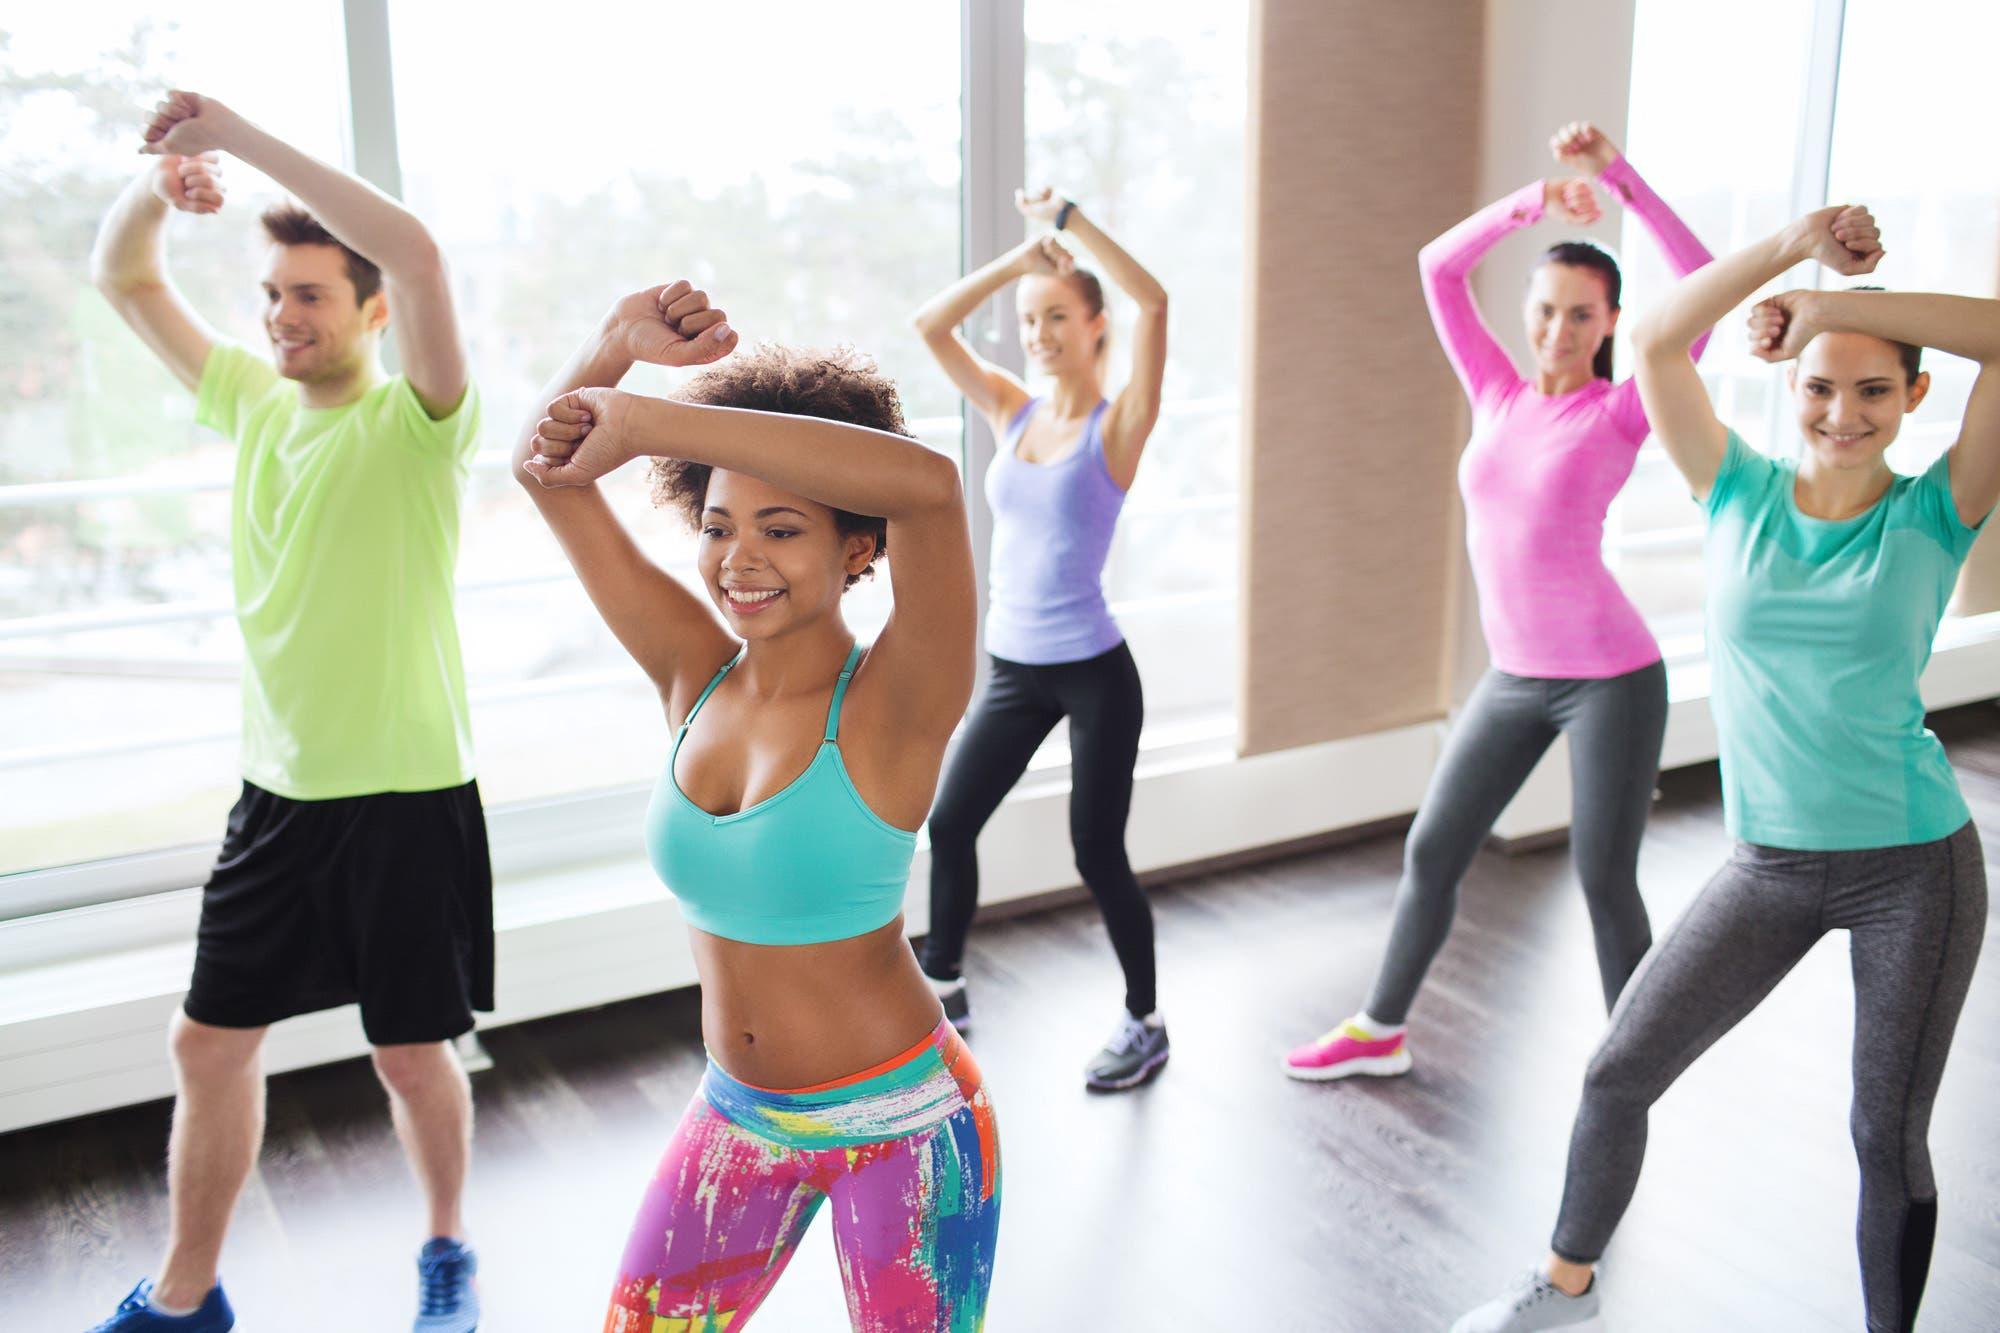 Clase de aerobic para adelgazar. pierde peso bailando